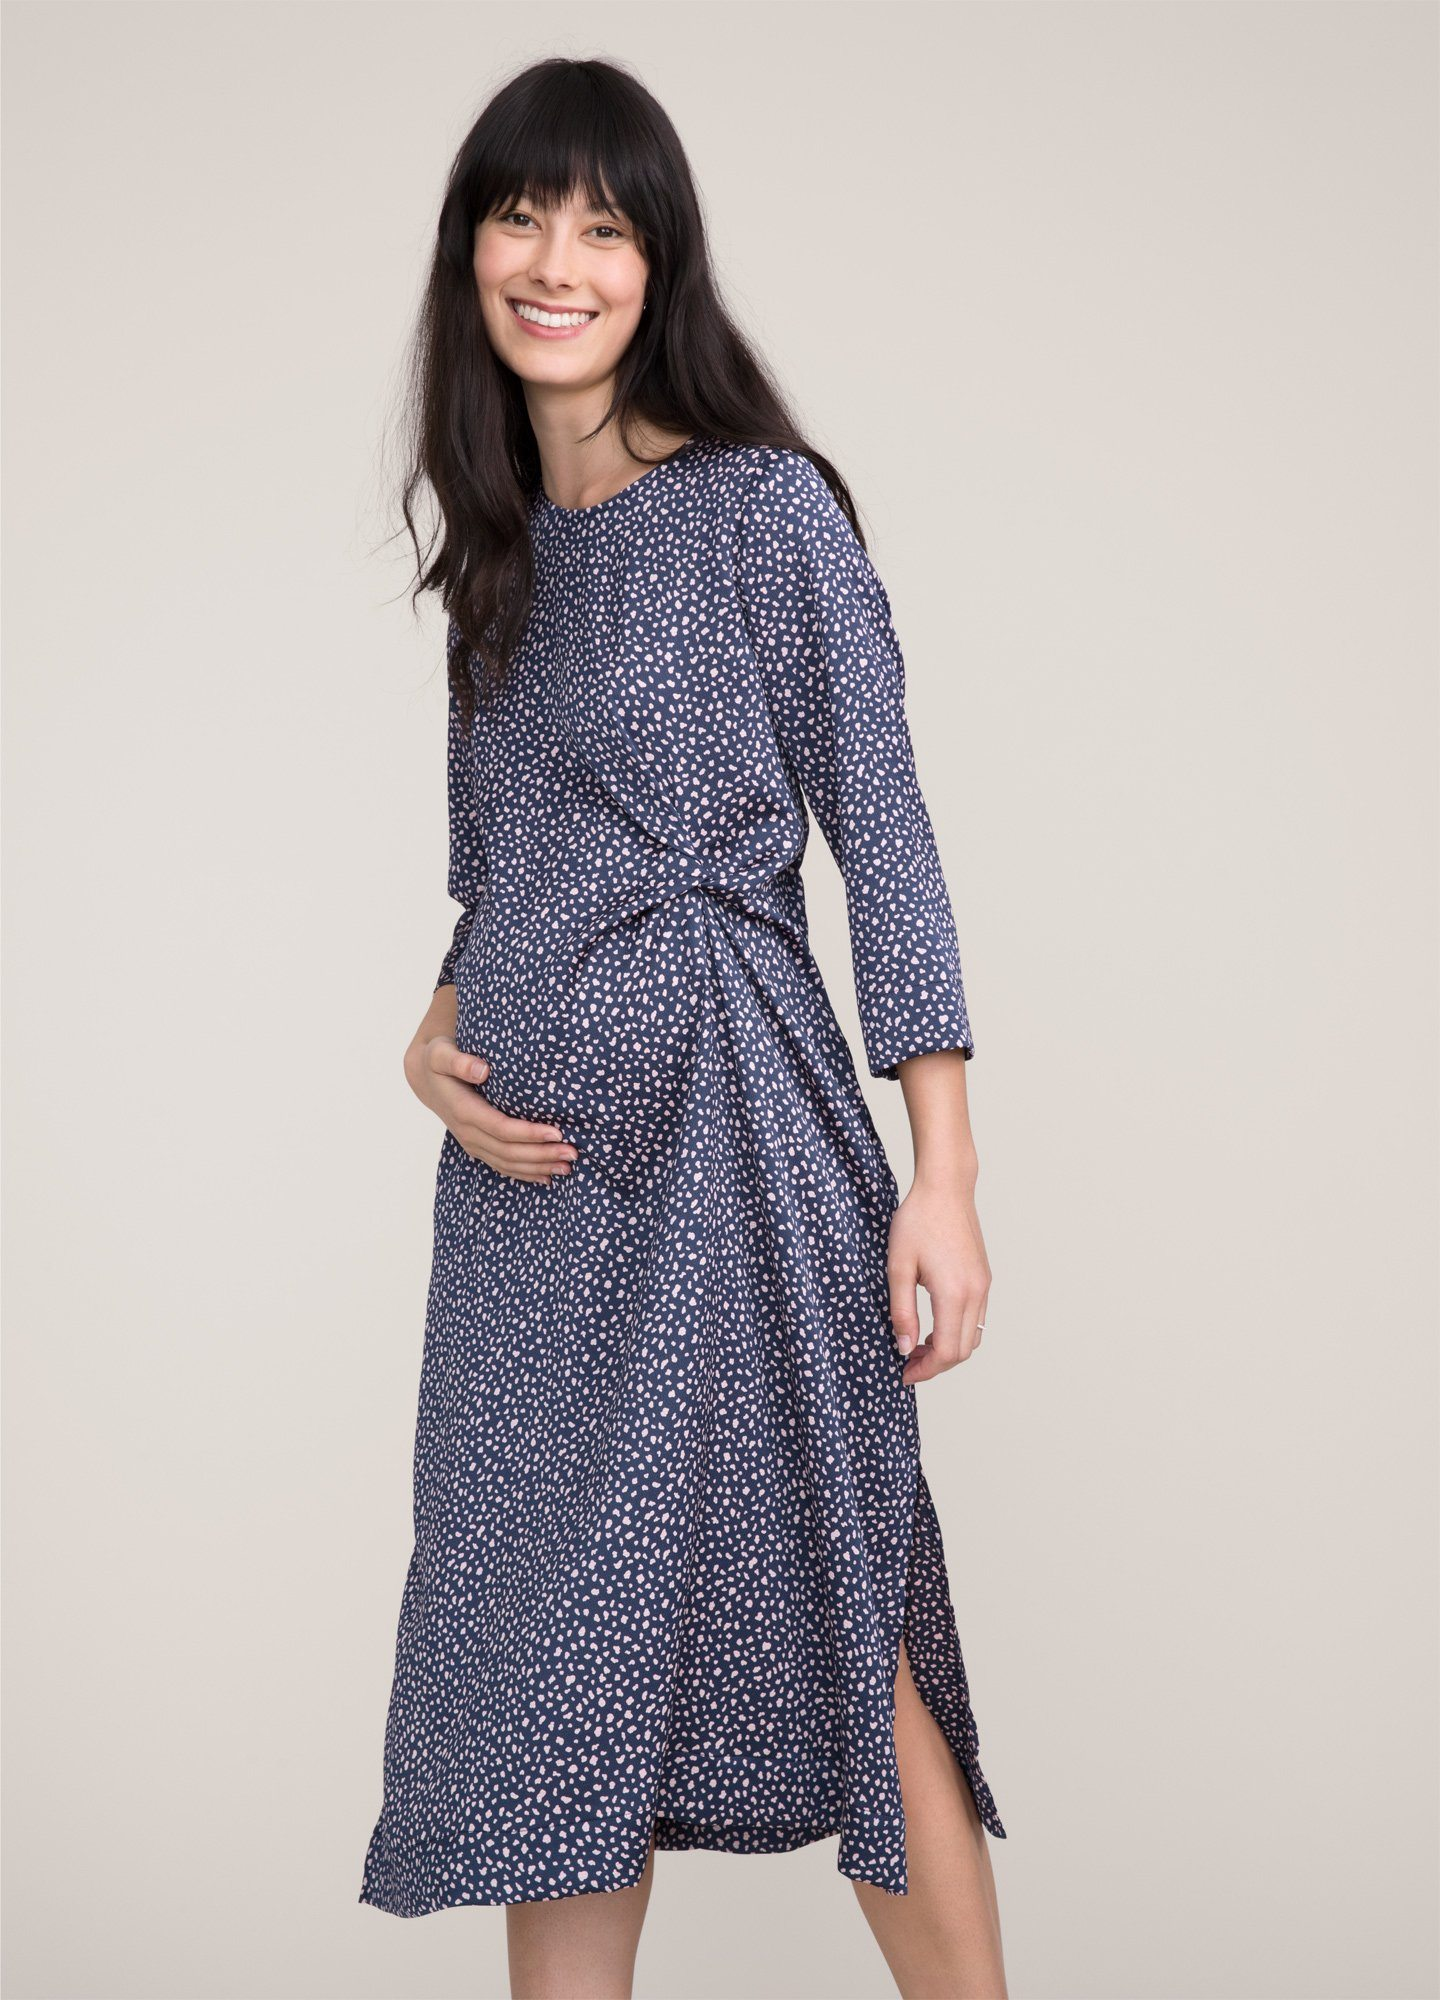 HATCH Maternity The Lauren Dress, navy Cheetah, Size 2